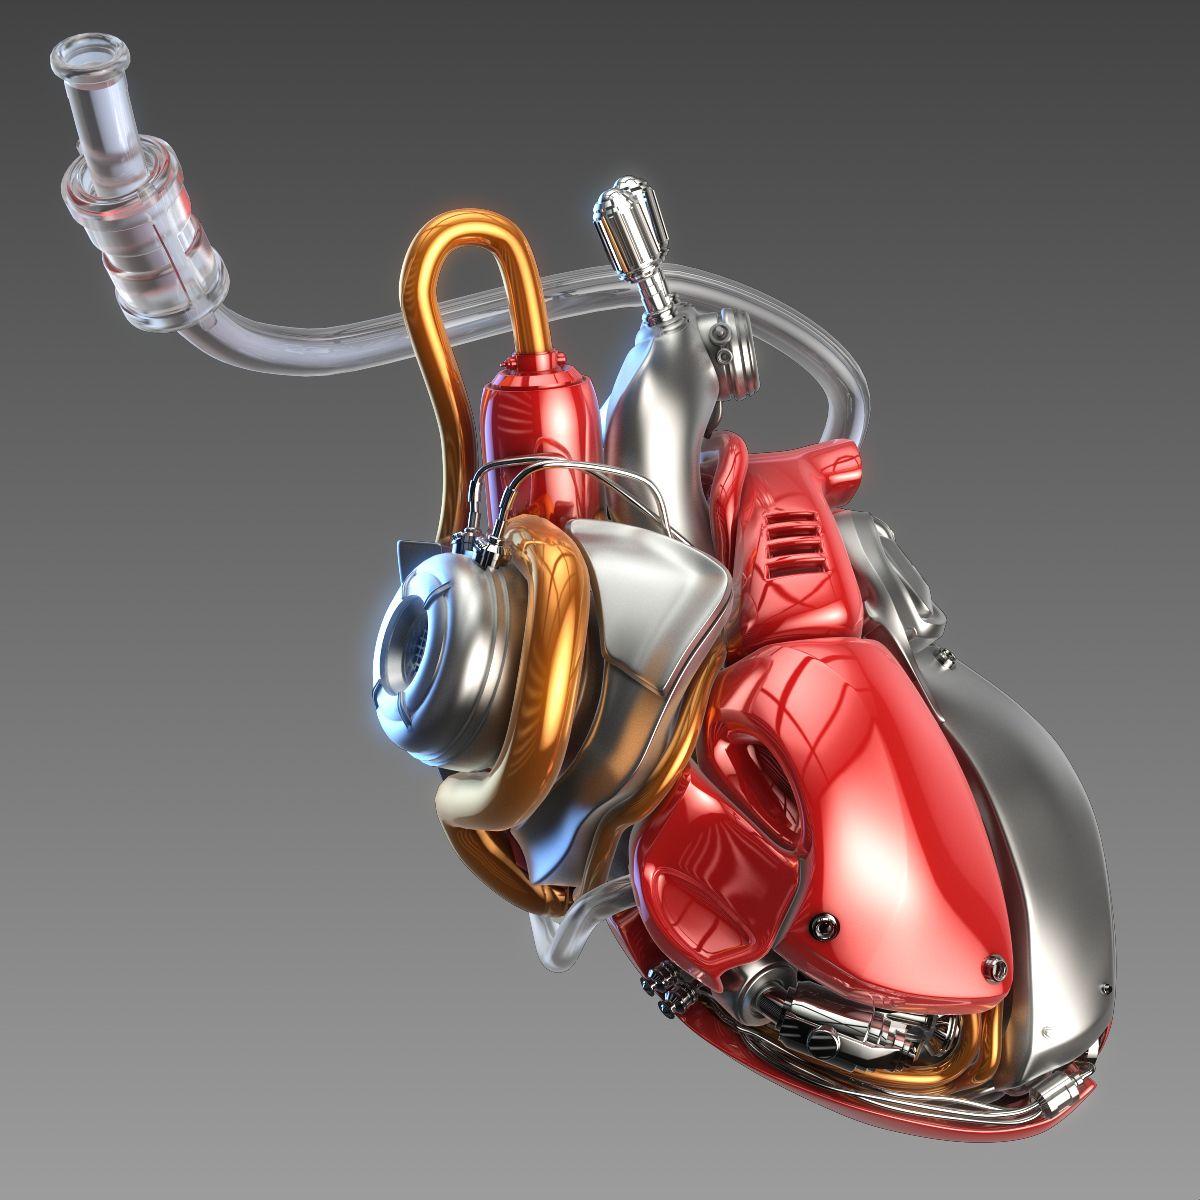 Artificial cyber heart #Artificial, #cyber, #heart | Graphic